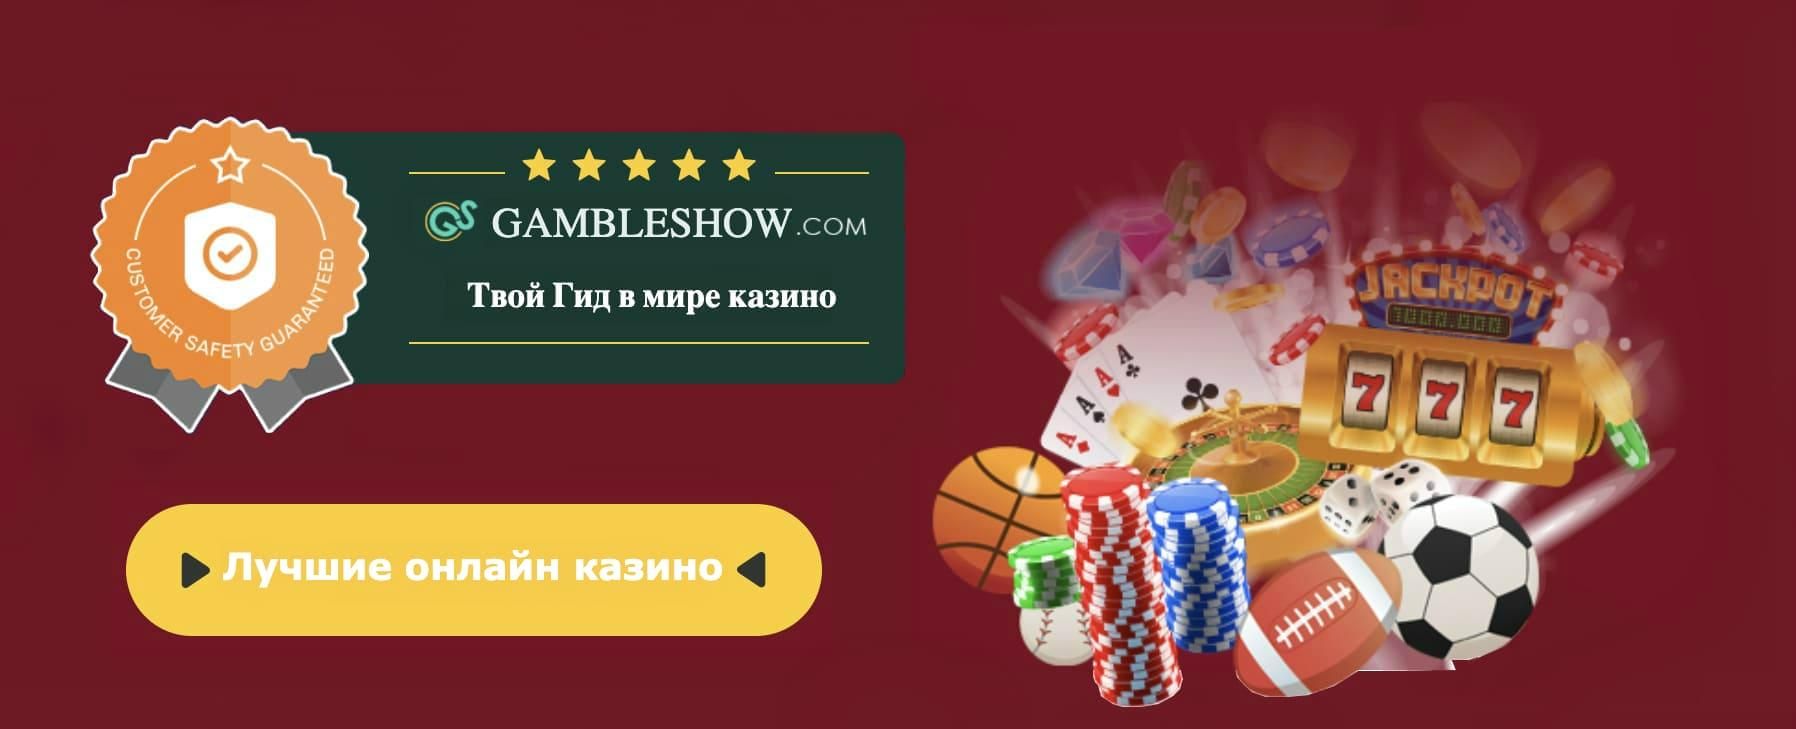 Бездепозитный бонус zigzag777 casino